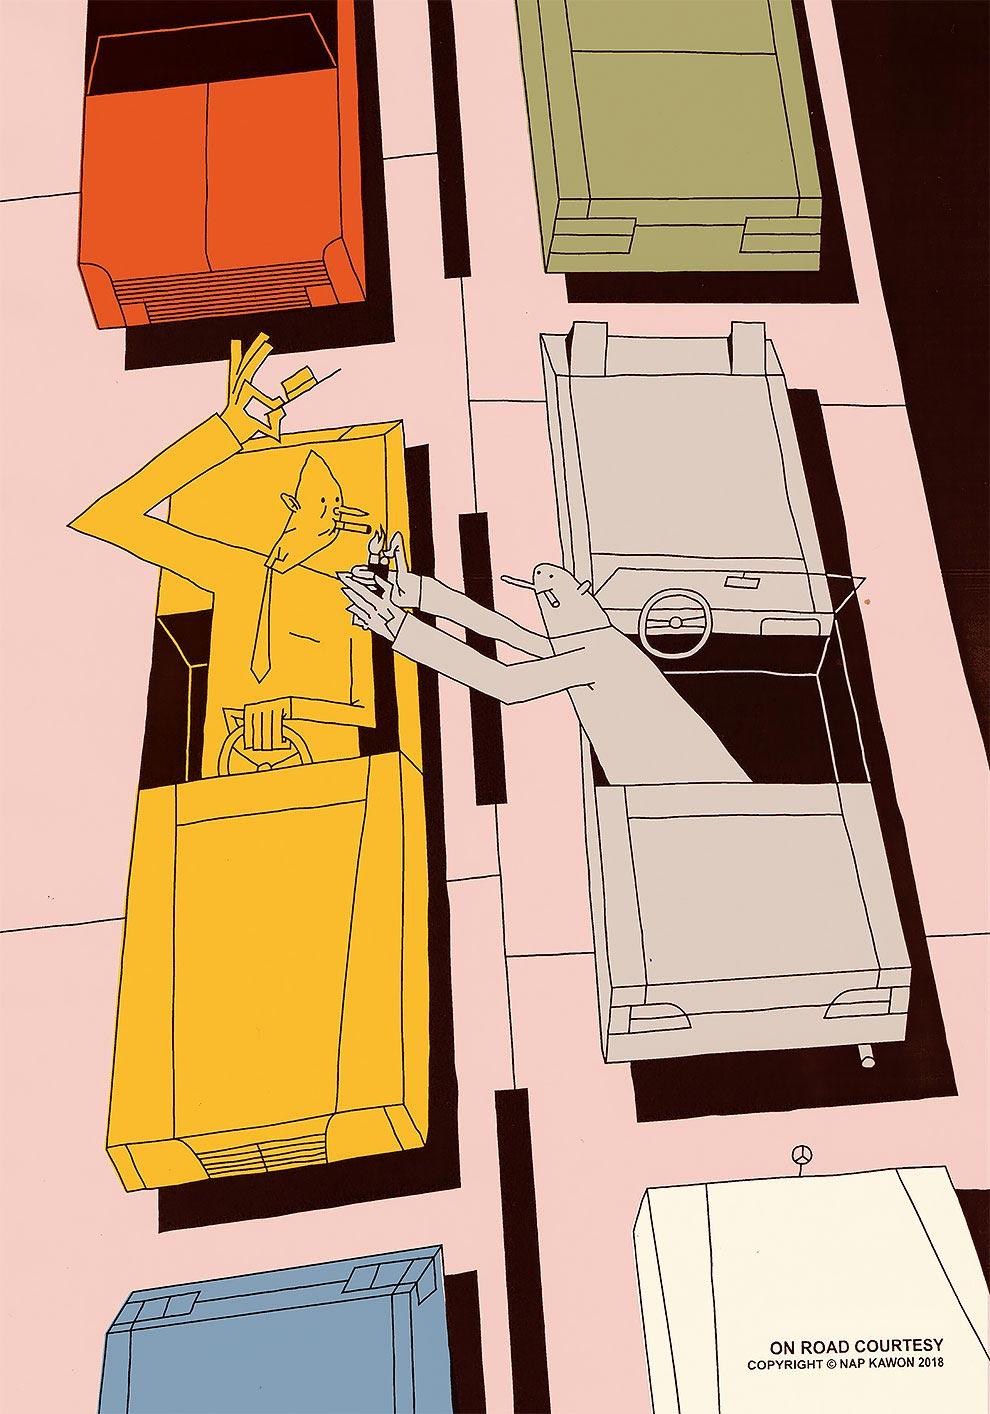 Krzysztof Nowak Кшиштоф Новак векторные иллюстрации